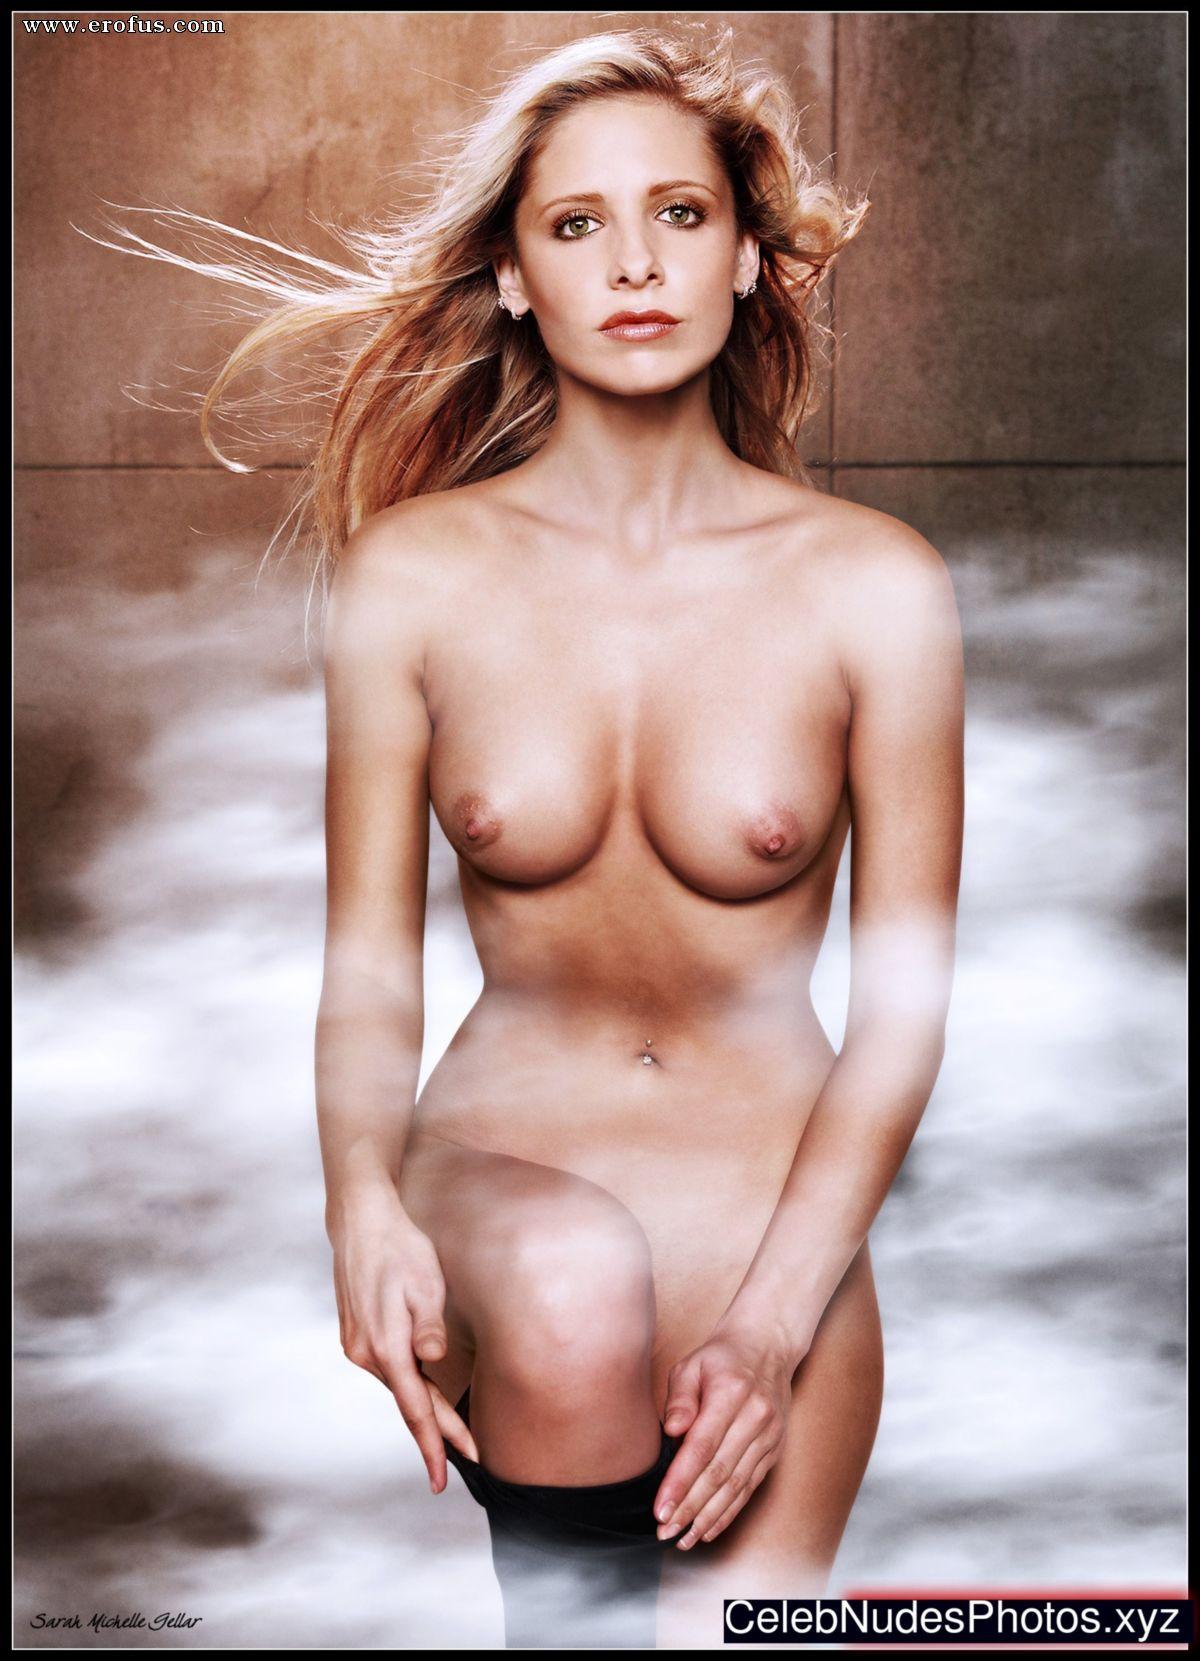 Sarah michelle gellar nude fakes